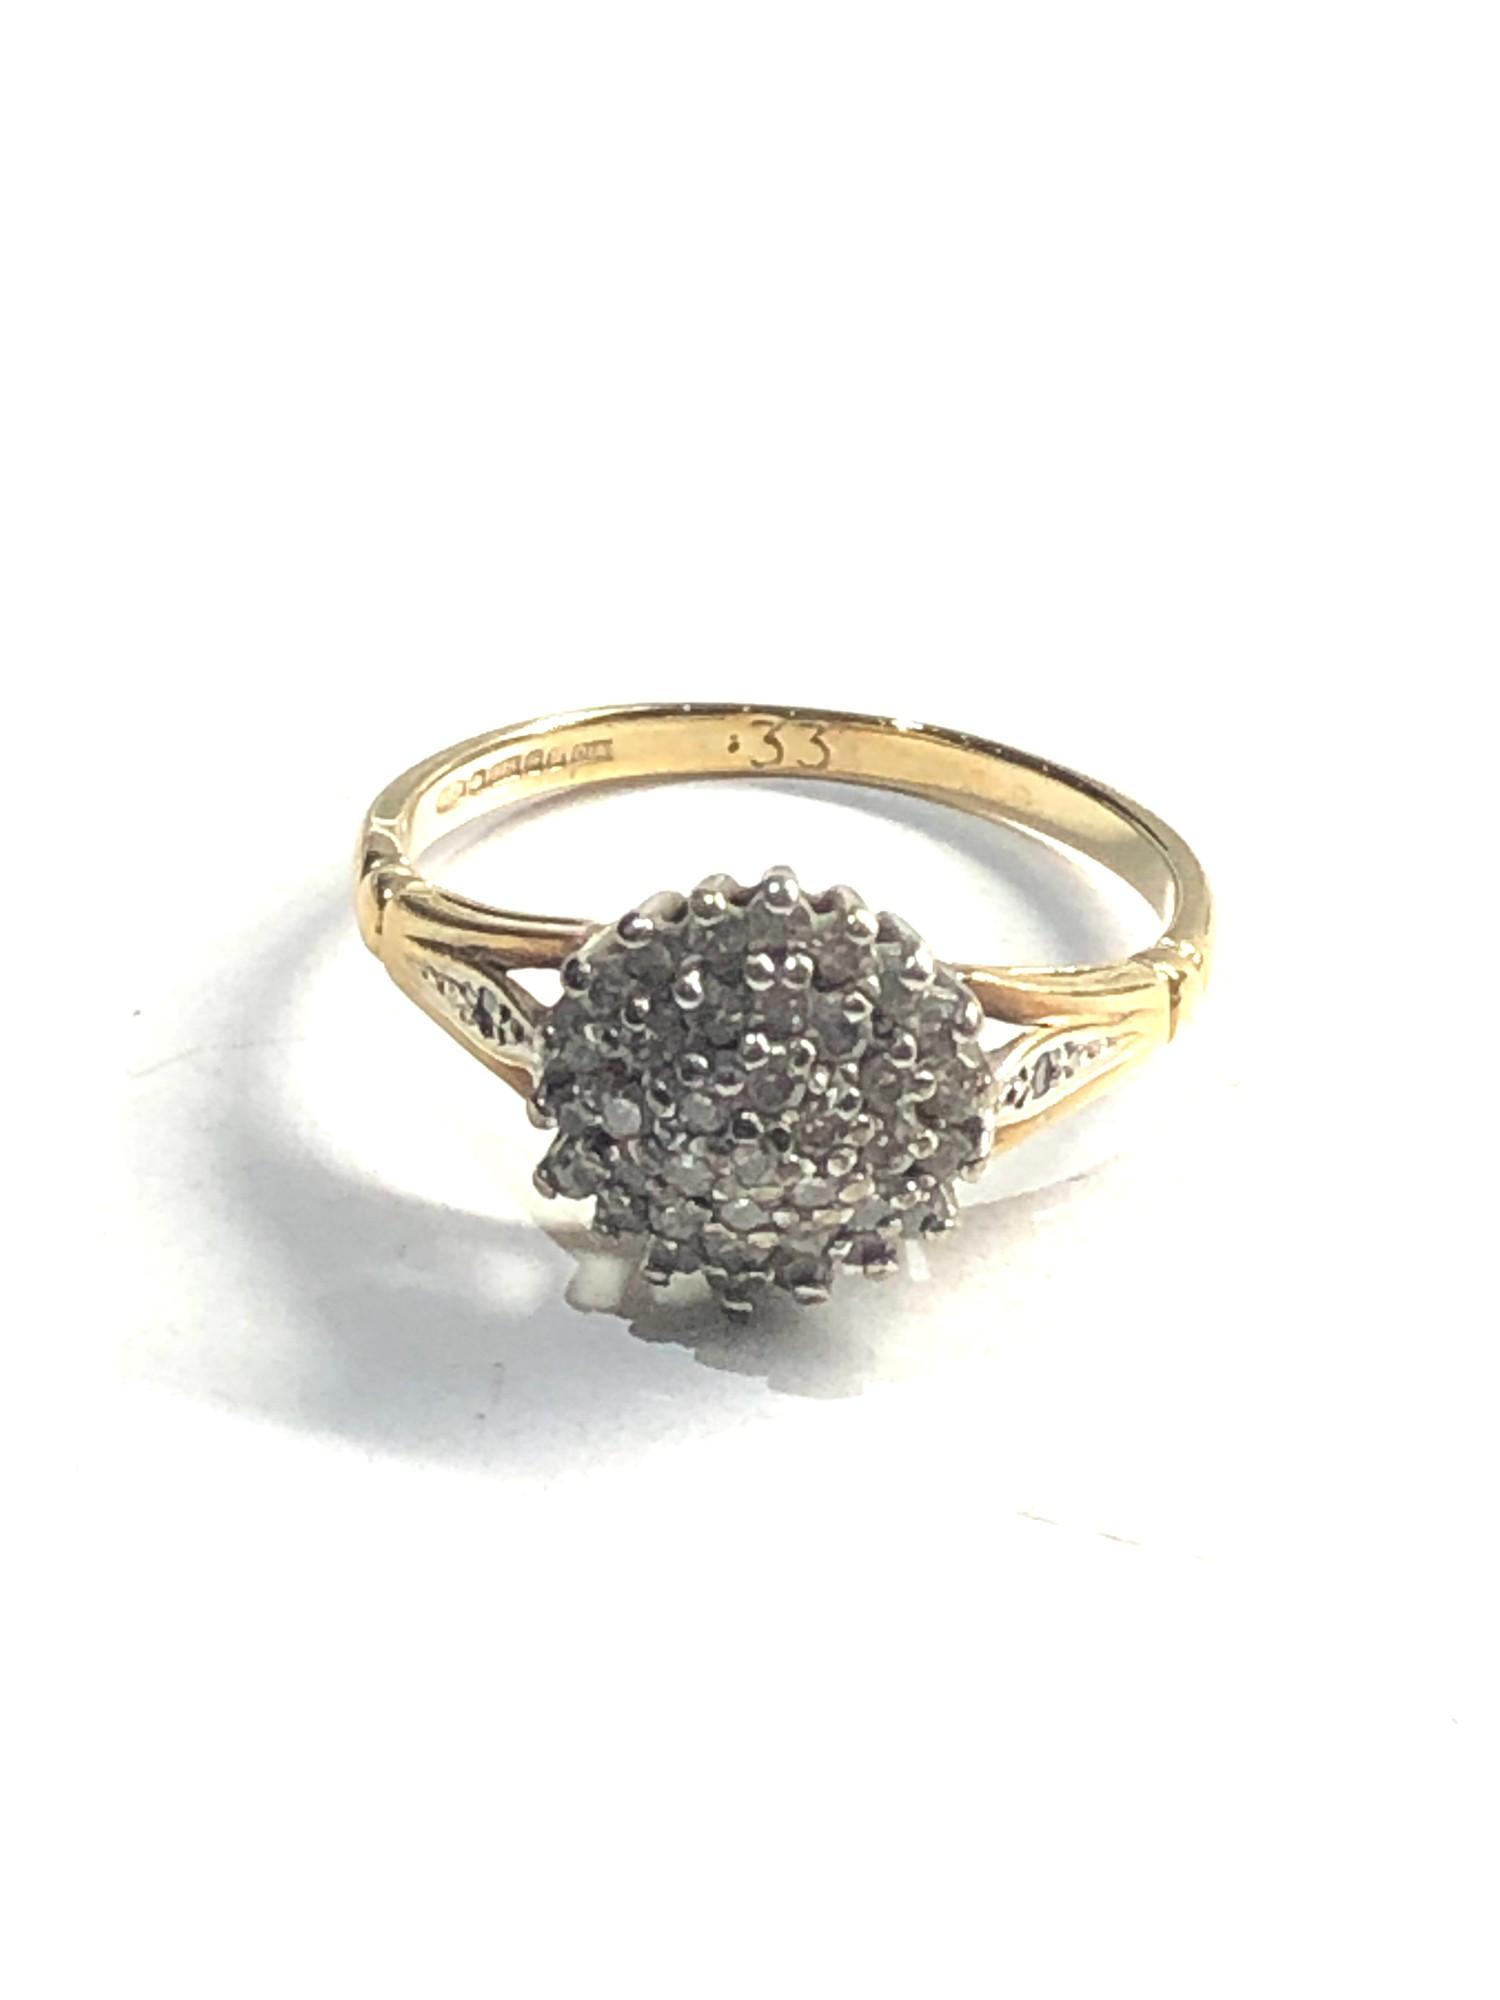 9ct gold diamond cluster ring 0.33ct diamonds